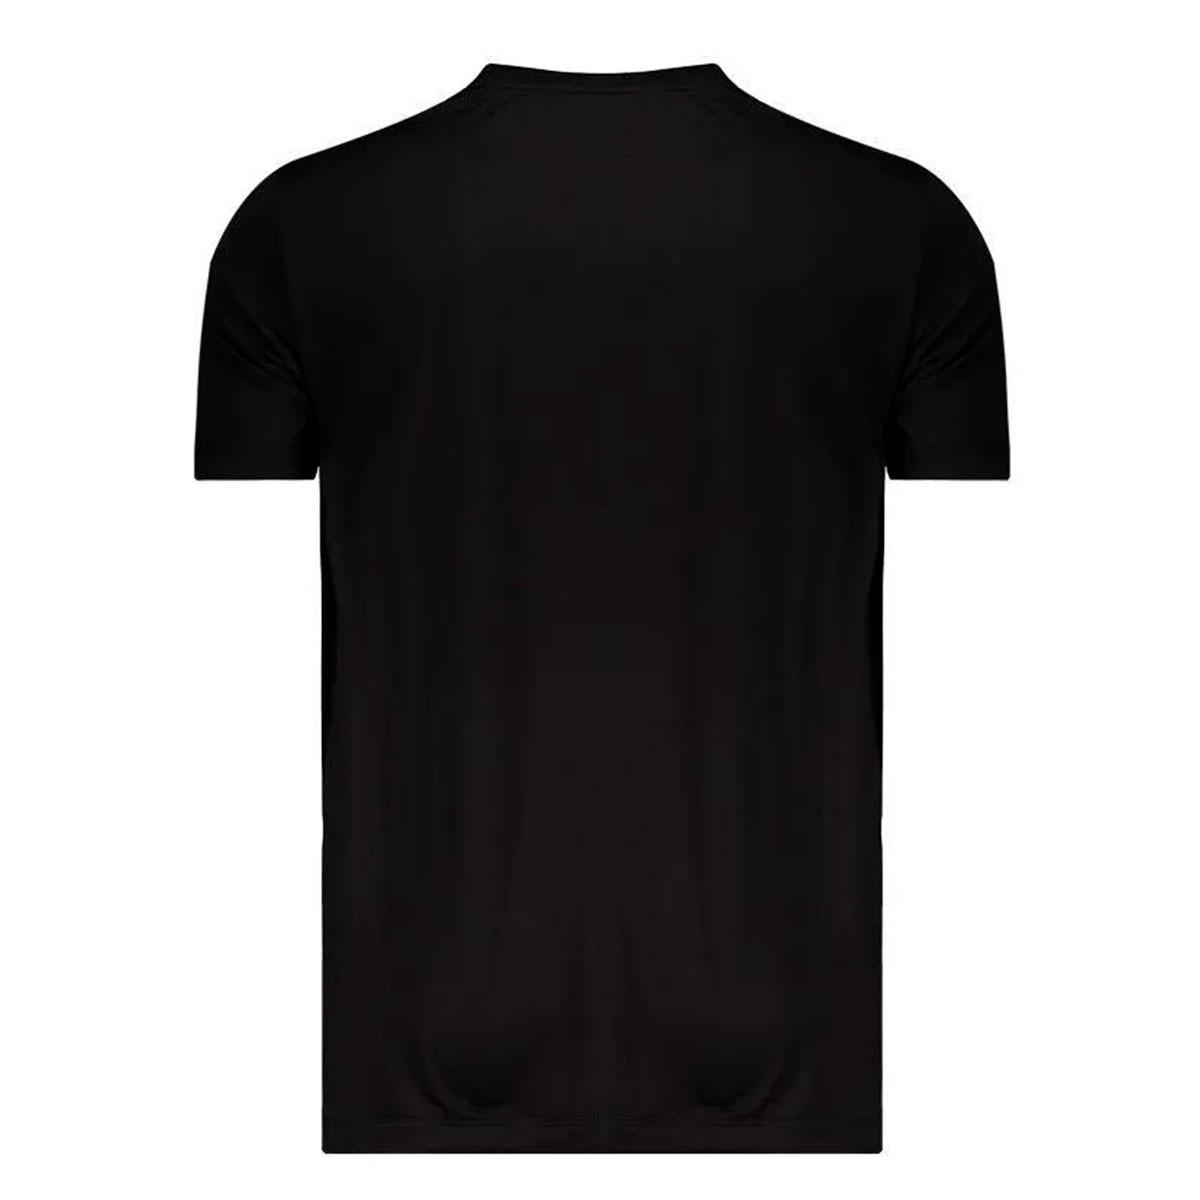 Camiseta Puma Ess Active Big Logo Masculina - Preto